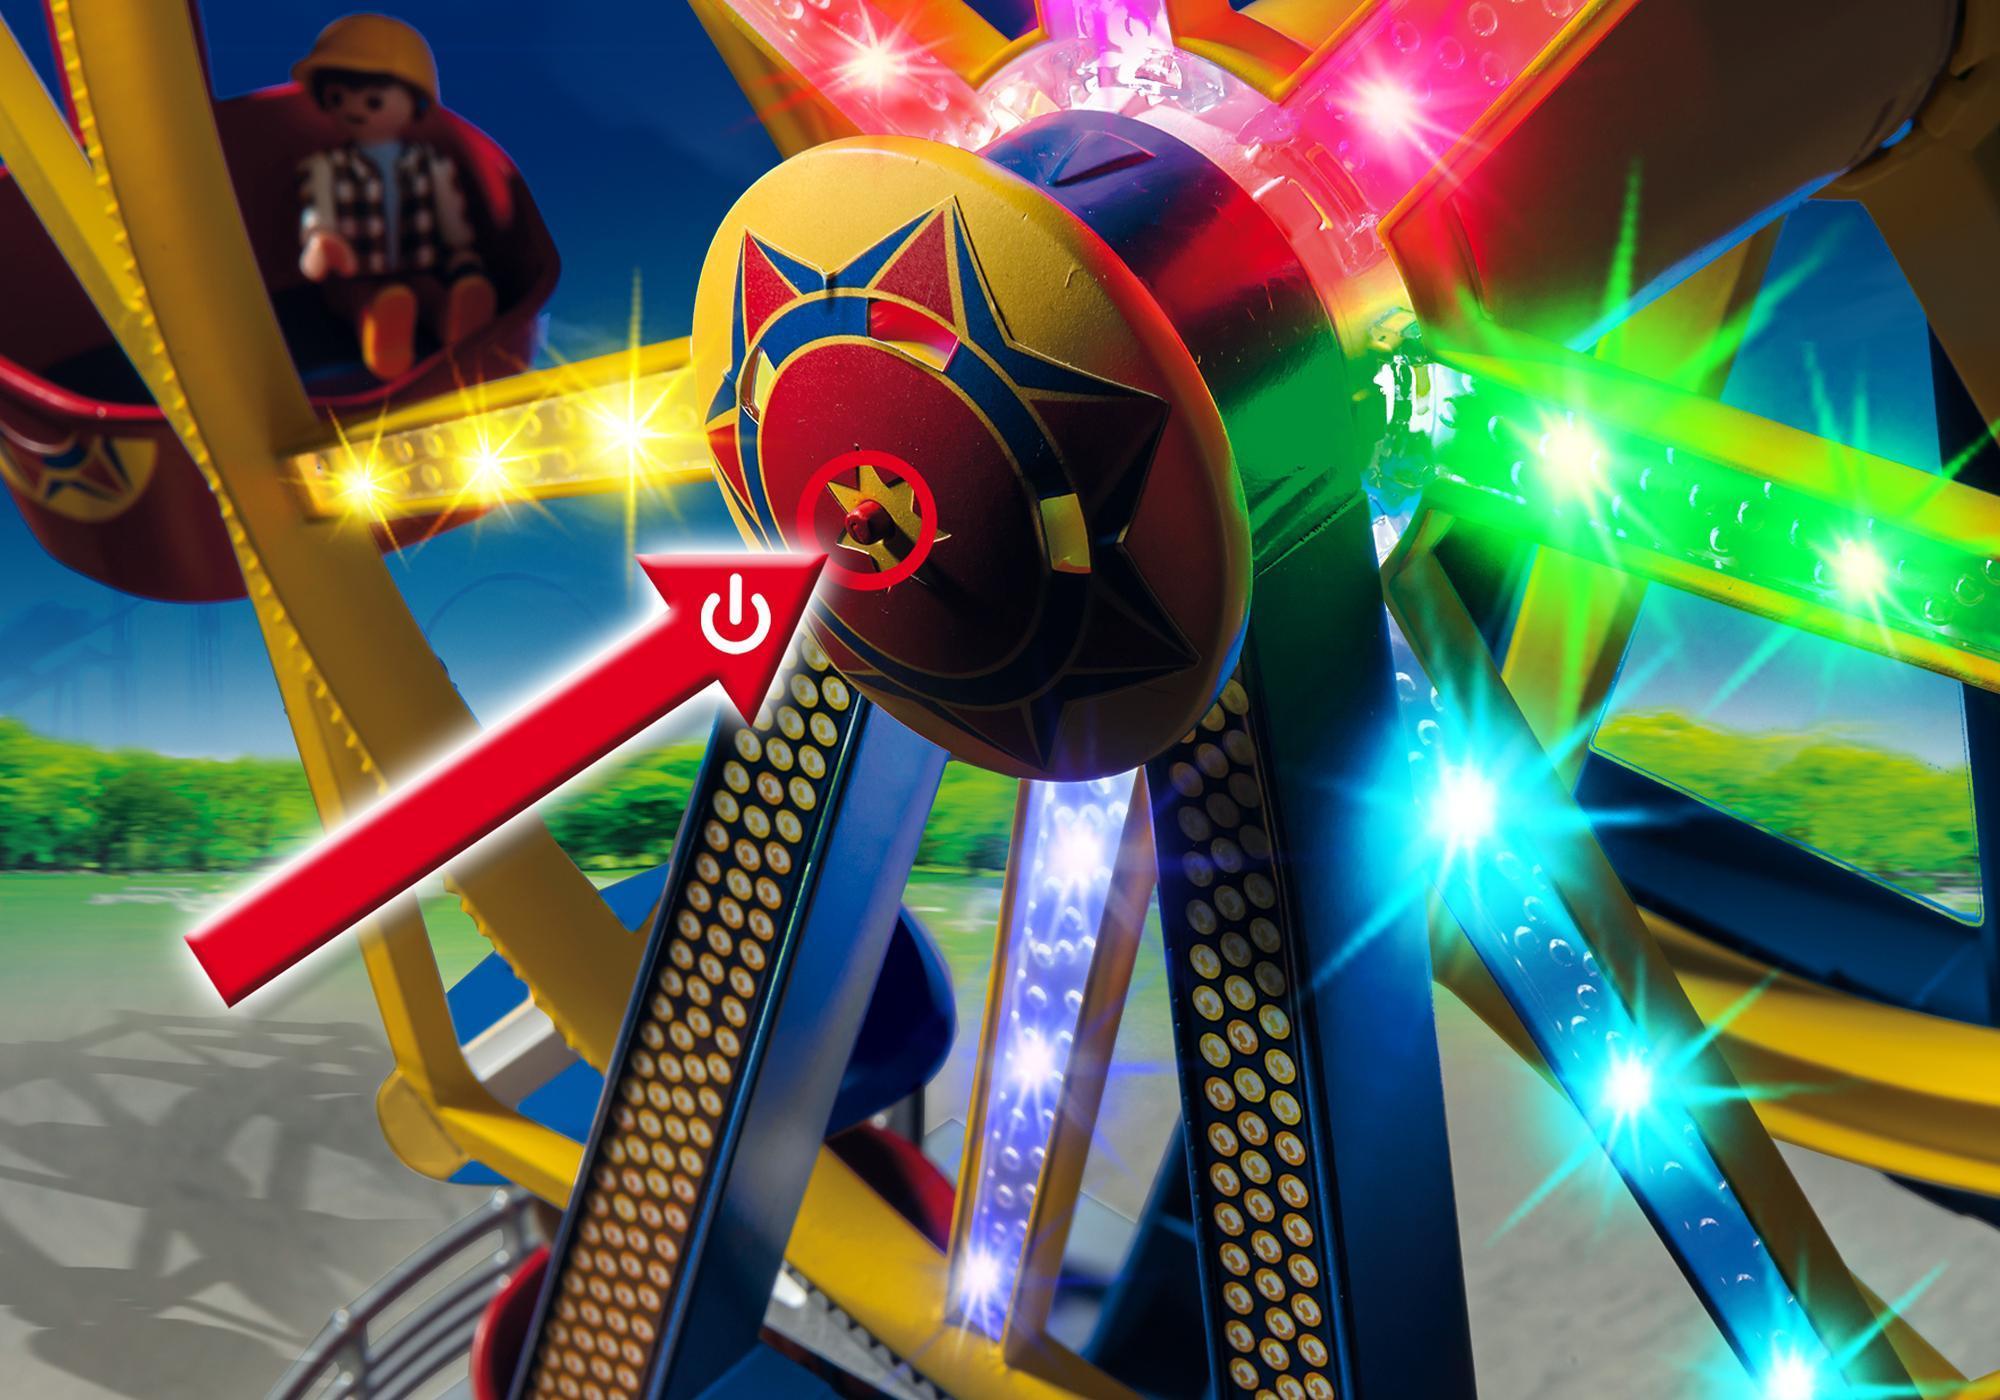 http://media.playmobil.com/i/playmobil/5552_product_extra1/Riesenrad mit bunter Beleuchtung